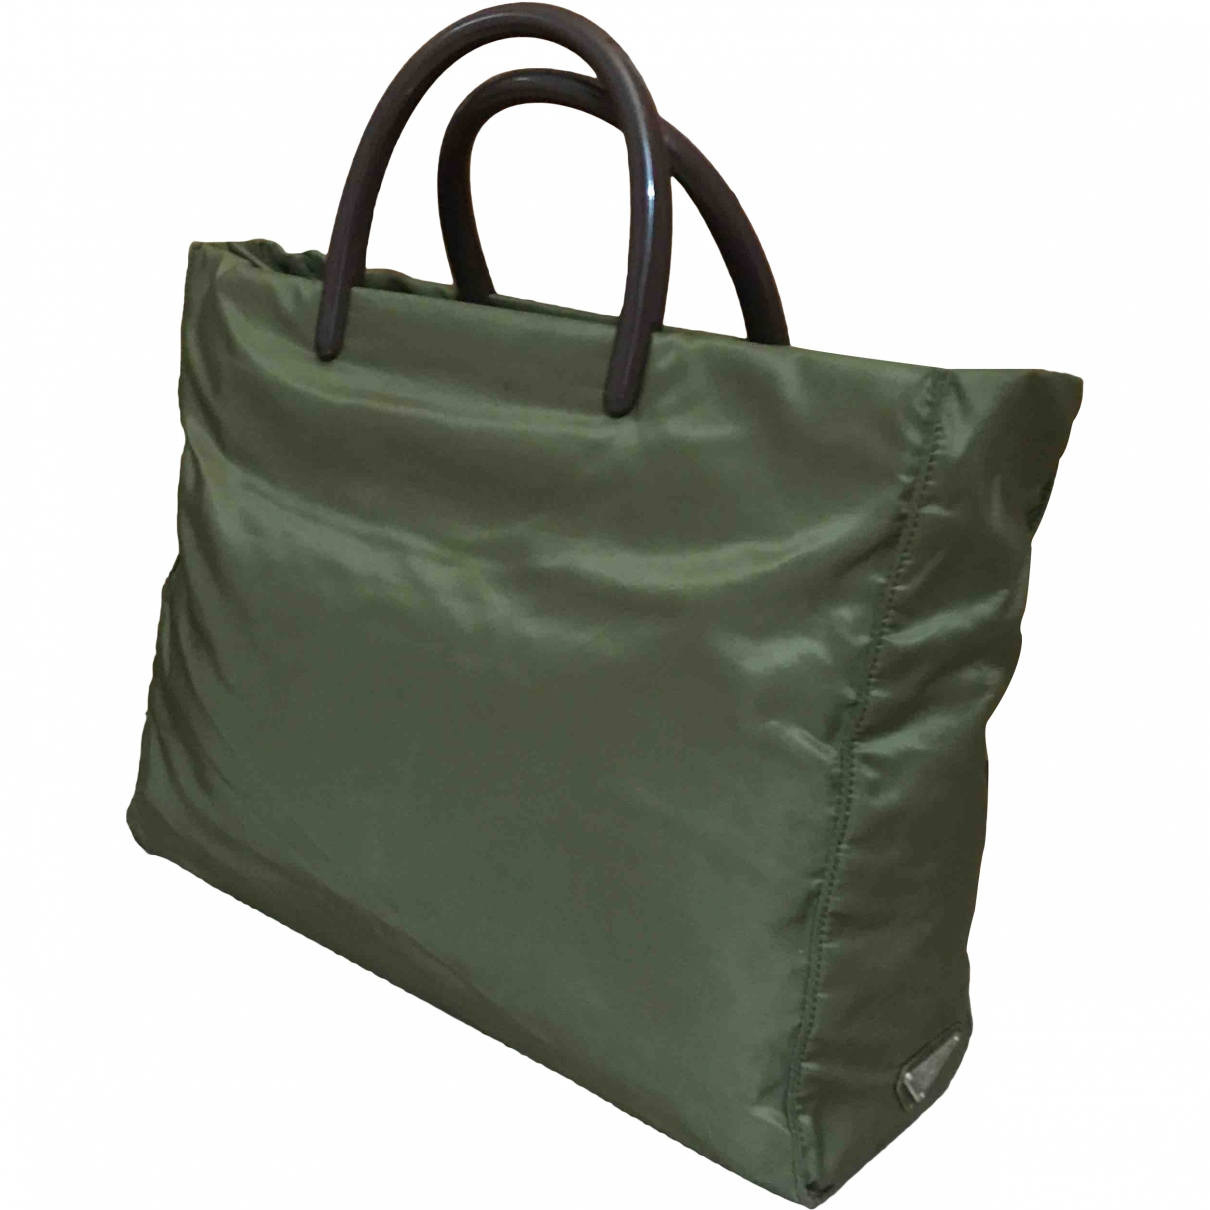 Prada \N Cloth handbag for Women \N